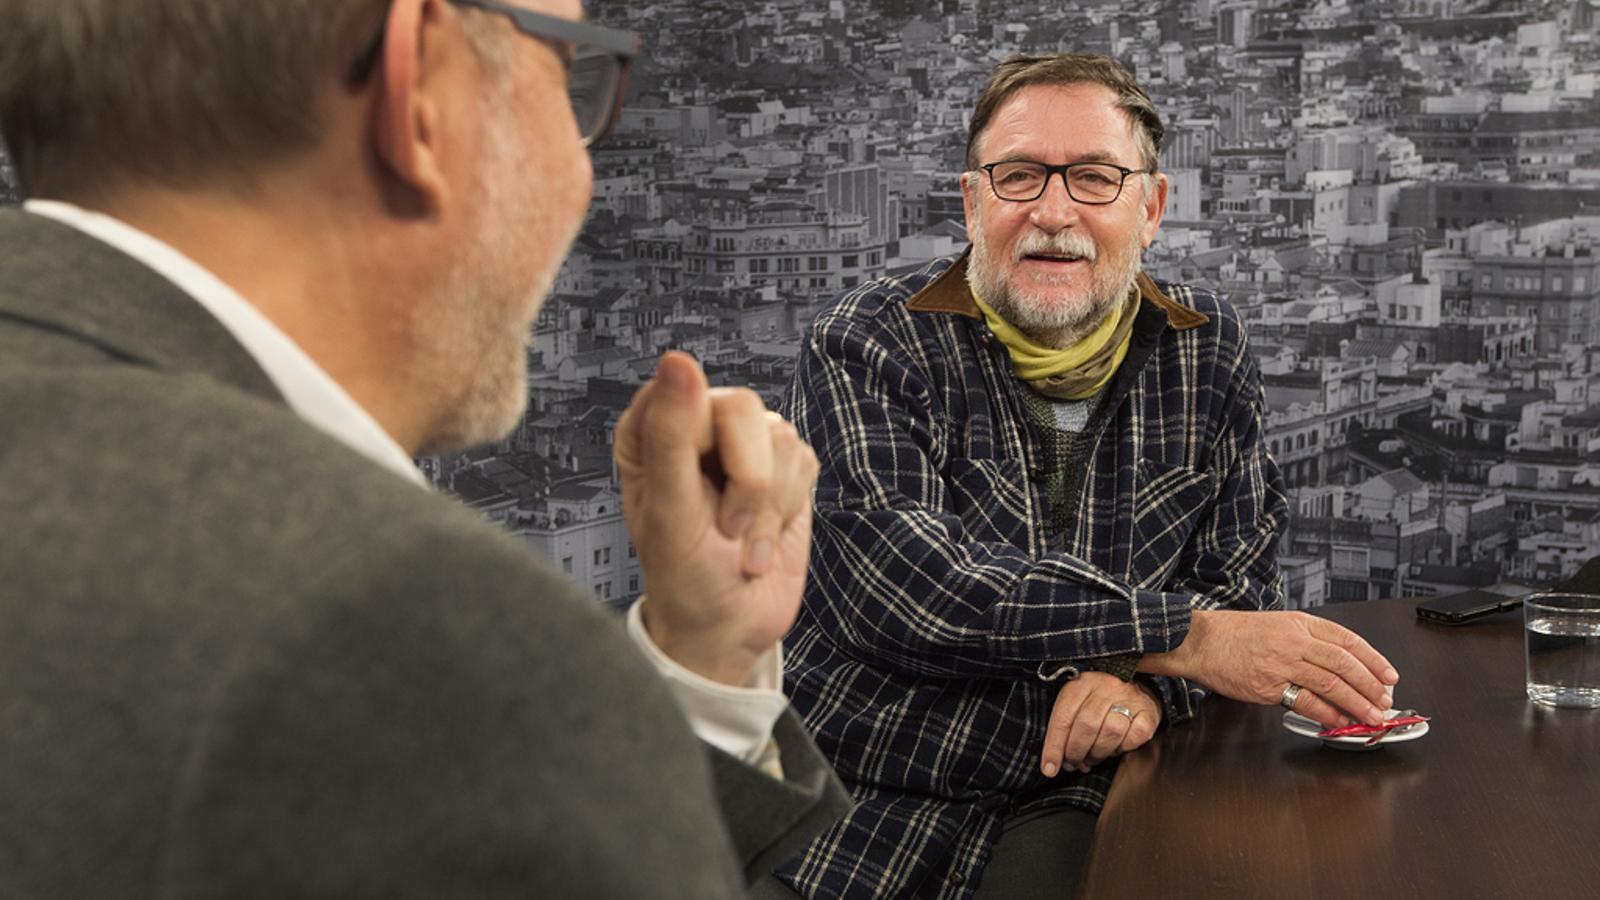 Entrevista d'Antoni Bassas a Martí Boada